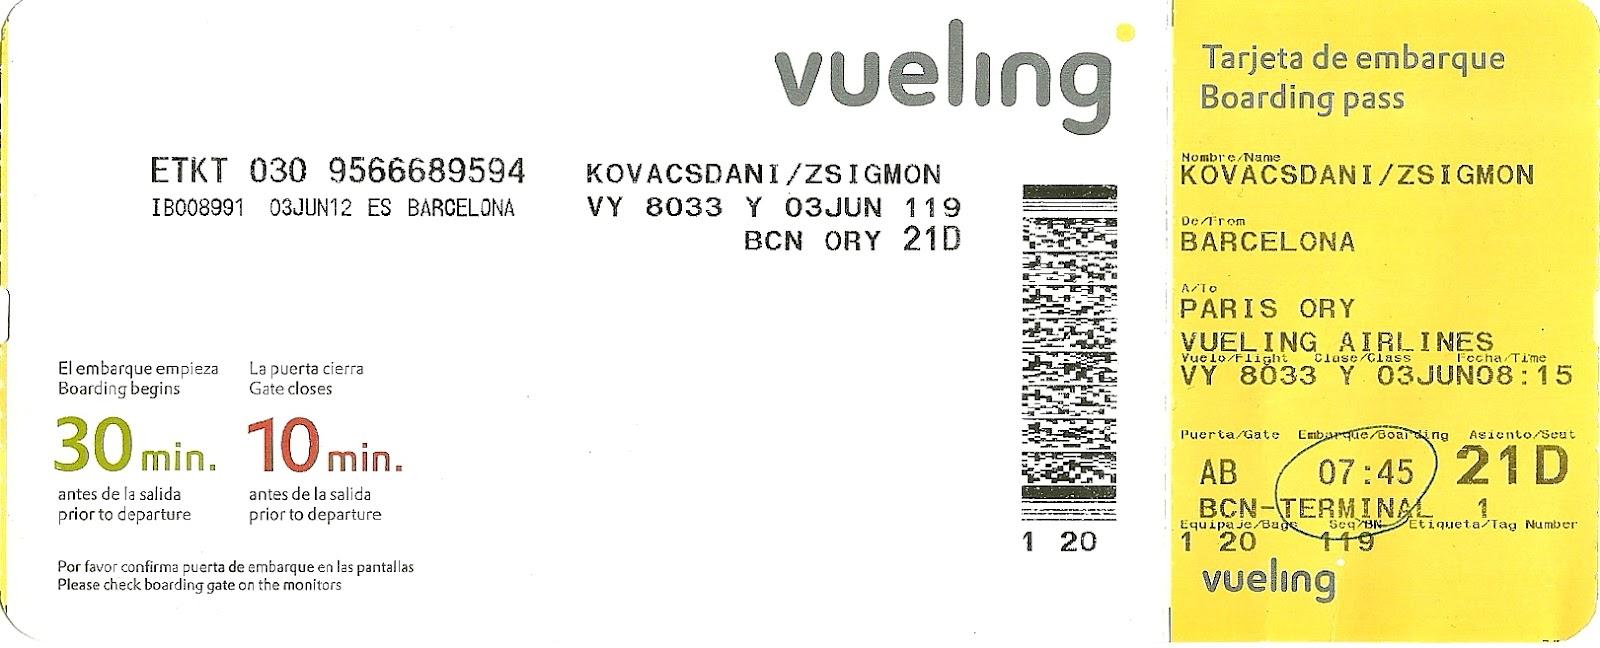 Targeta d embarcament per volar al carnaval hist ria for Ryanair barcelona paris orly